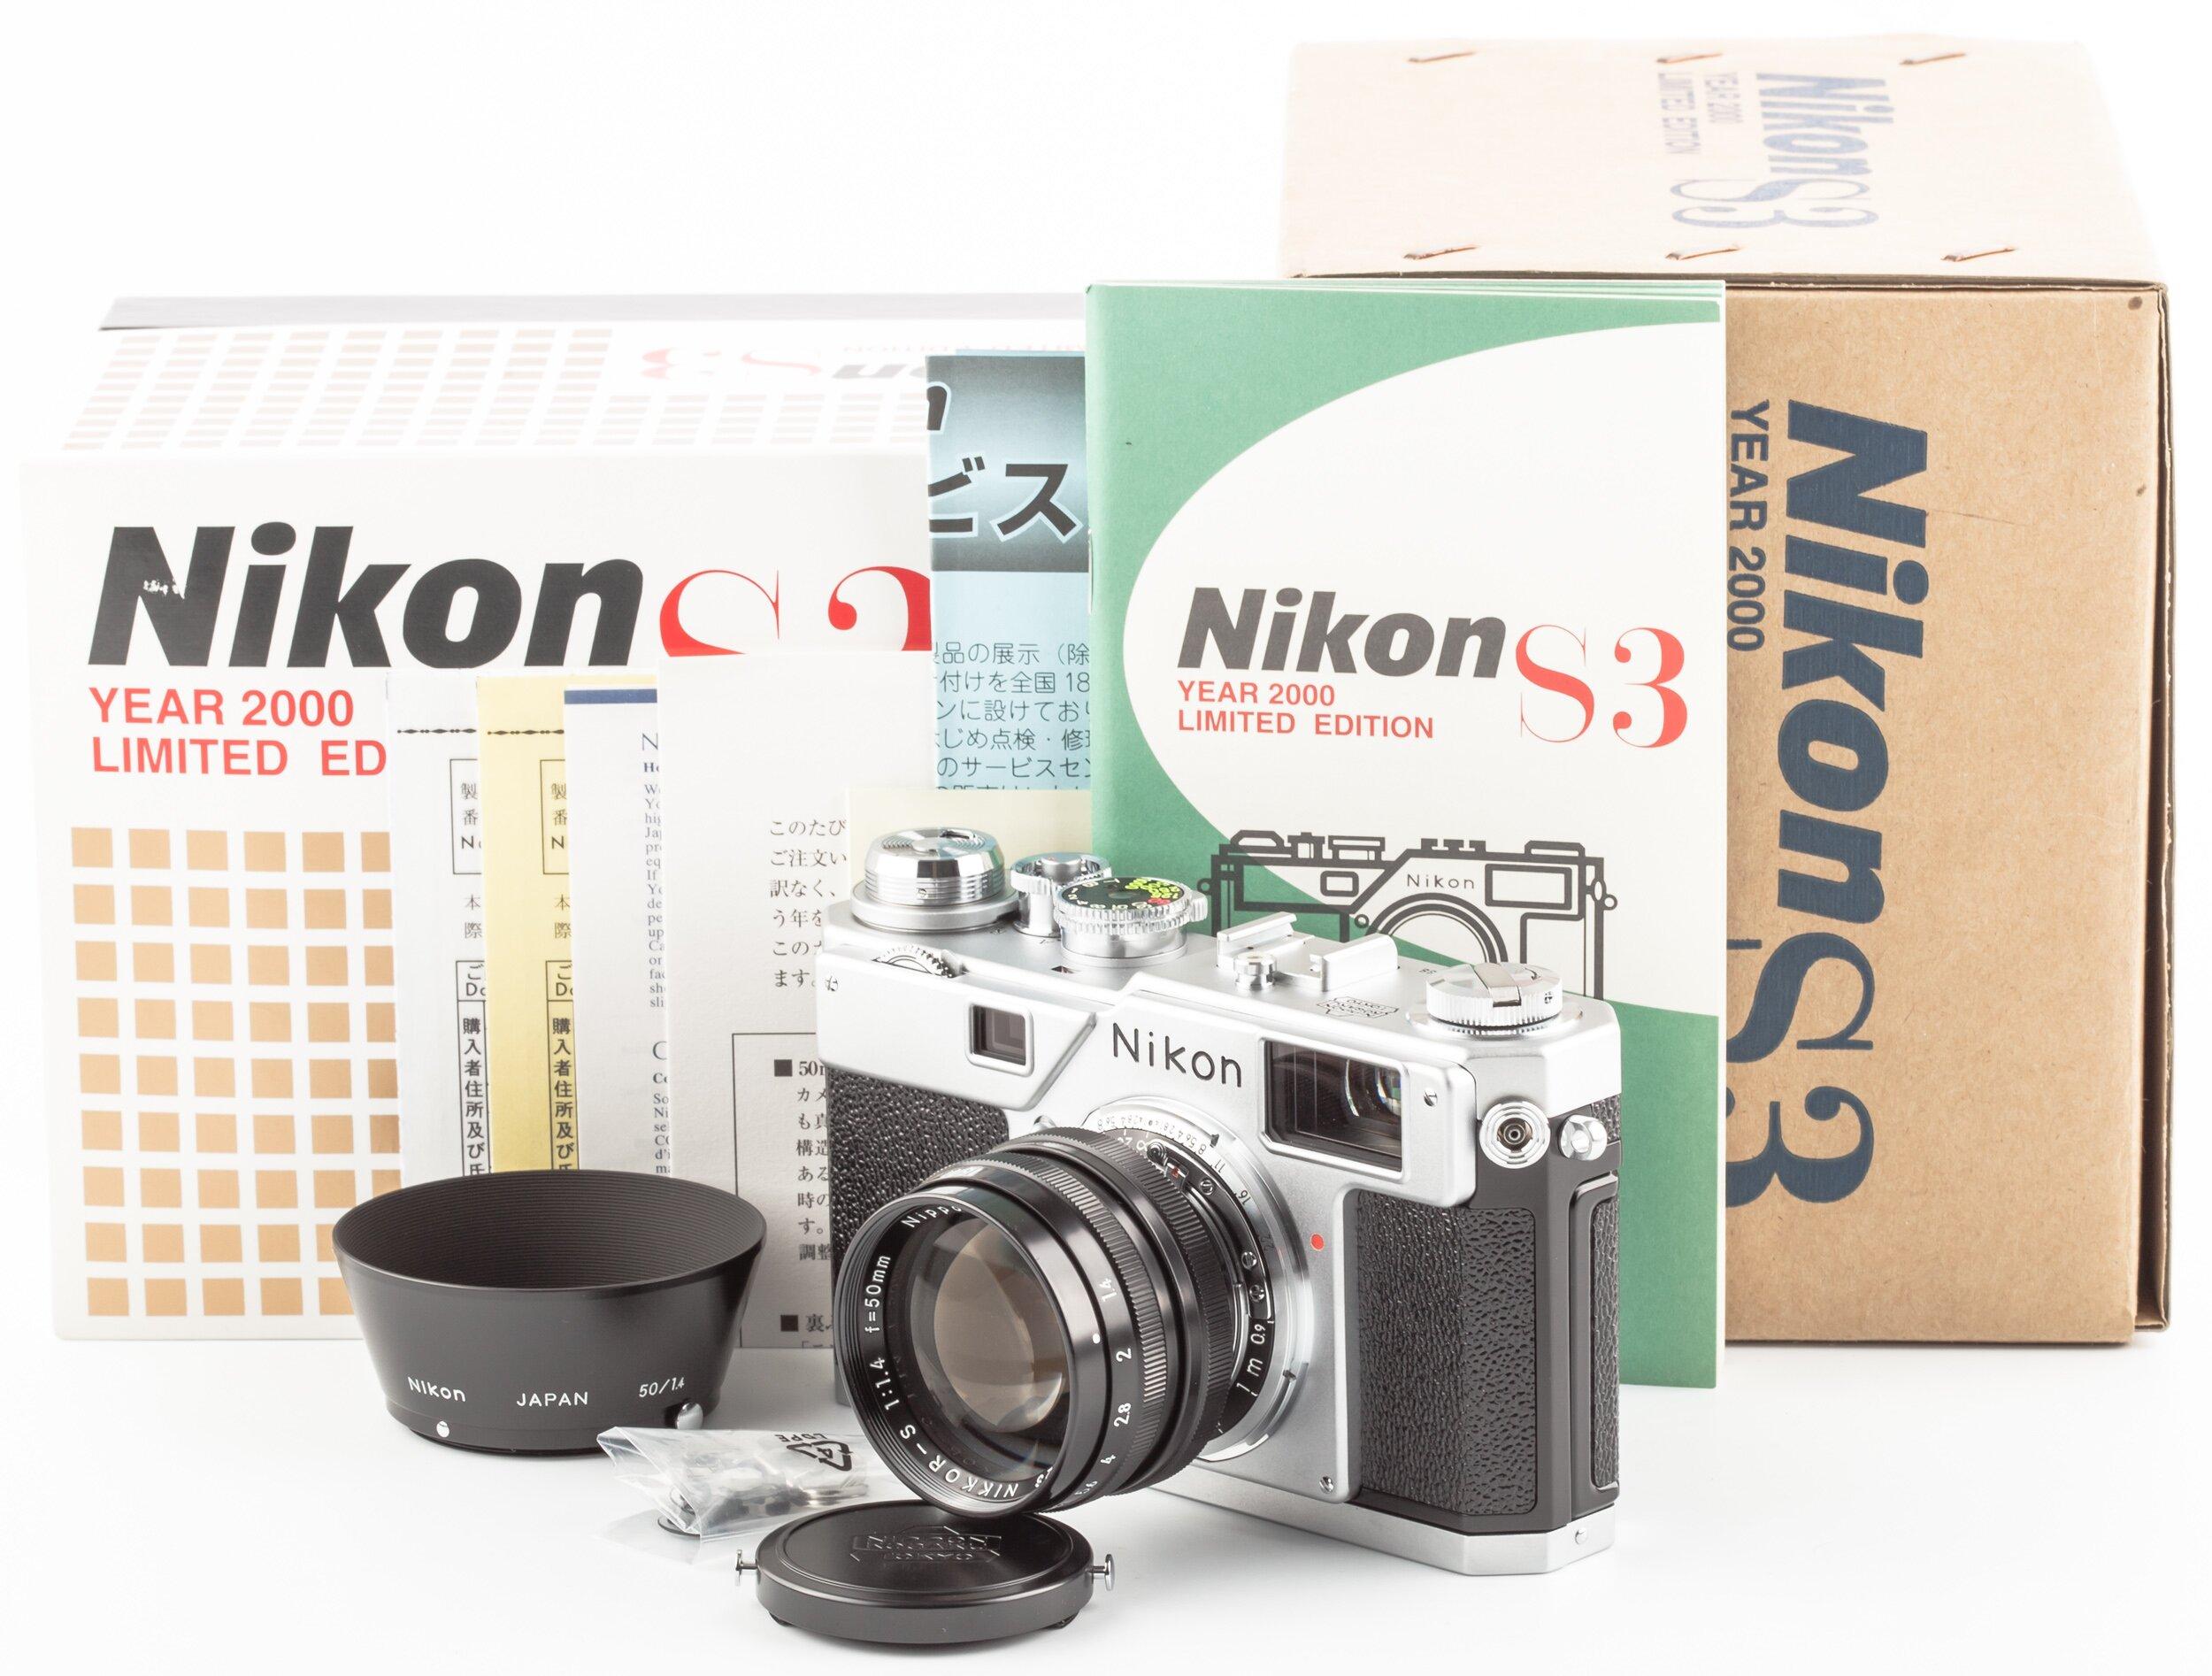 Nikon S3 Year 2000 Limited Edition mit Nippon-Kogaku Nikkor-S 1,4/50mm